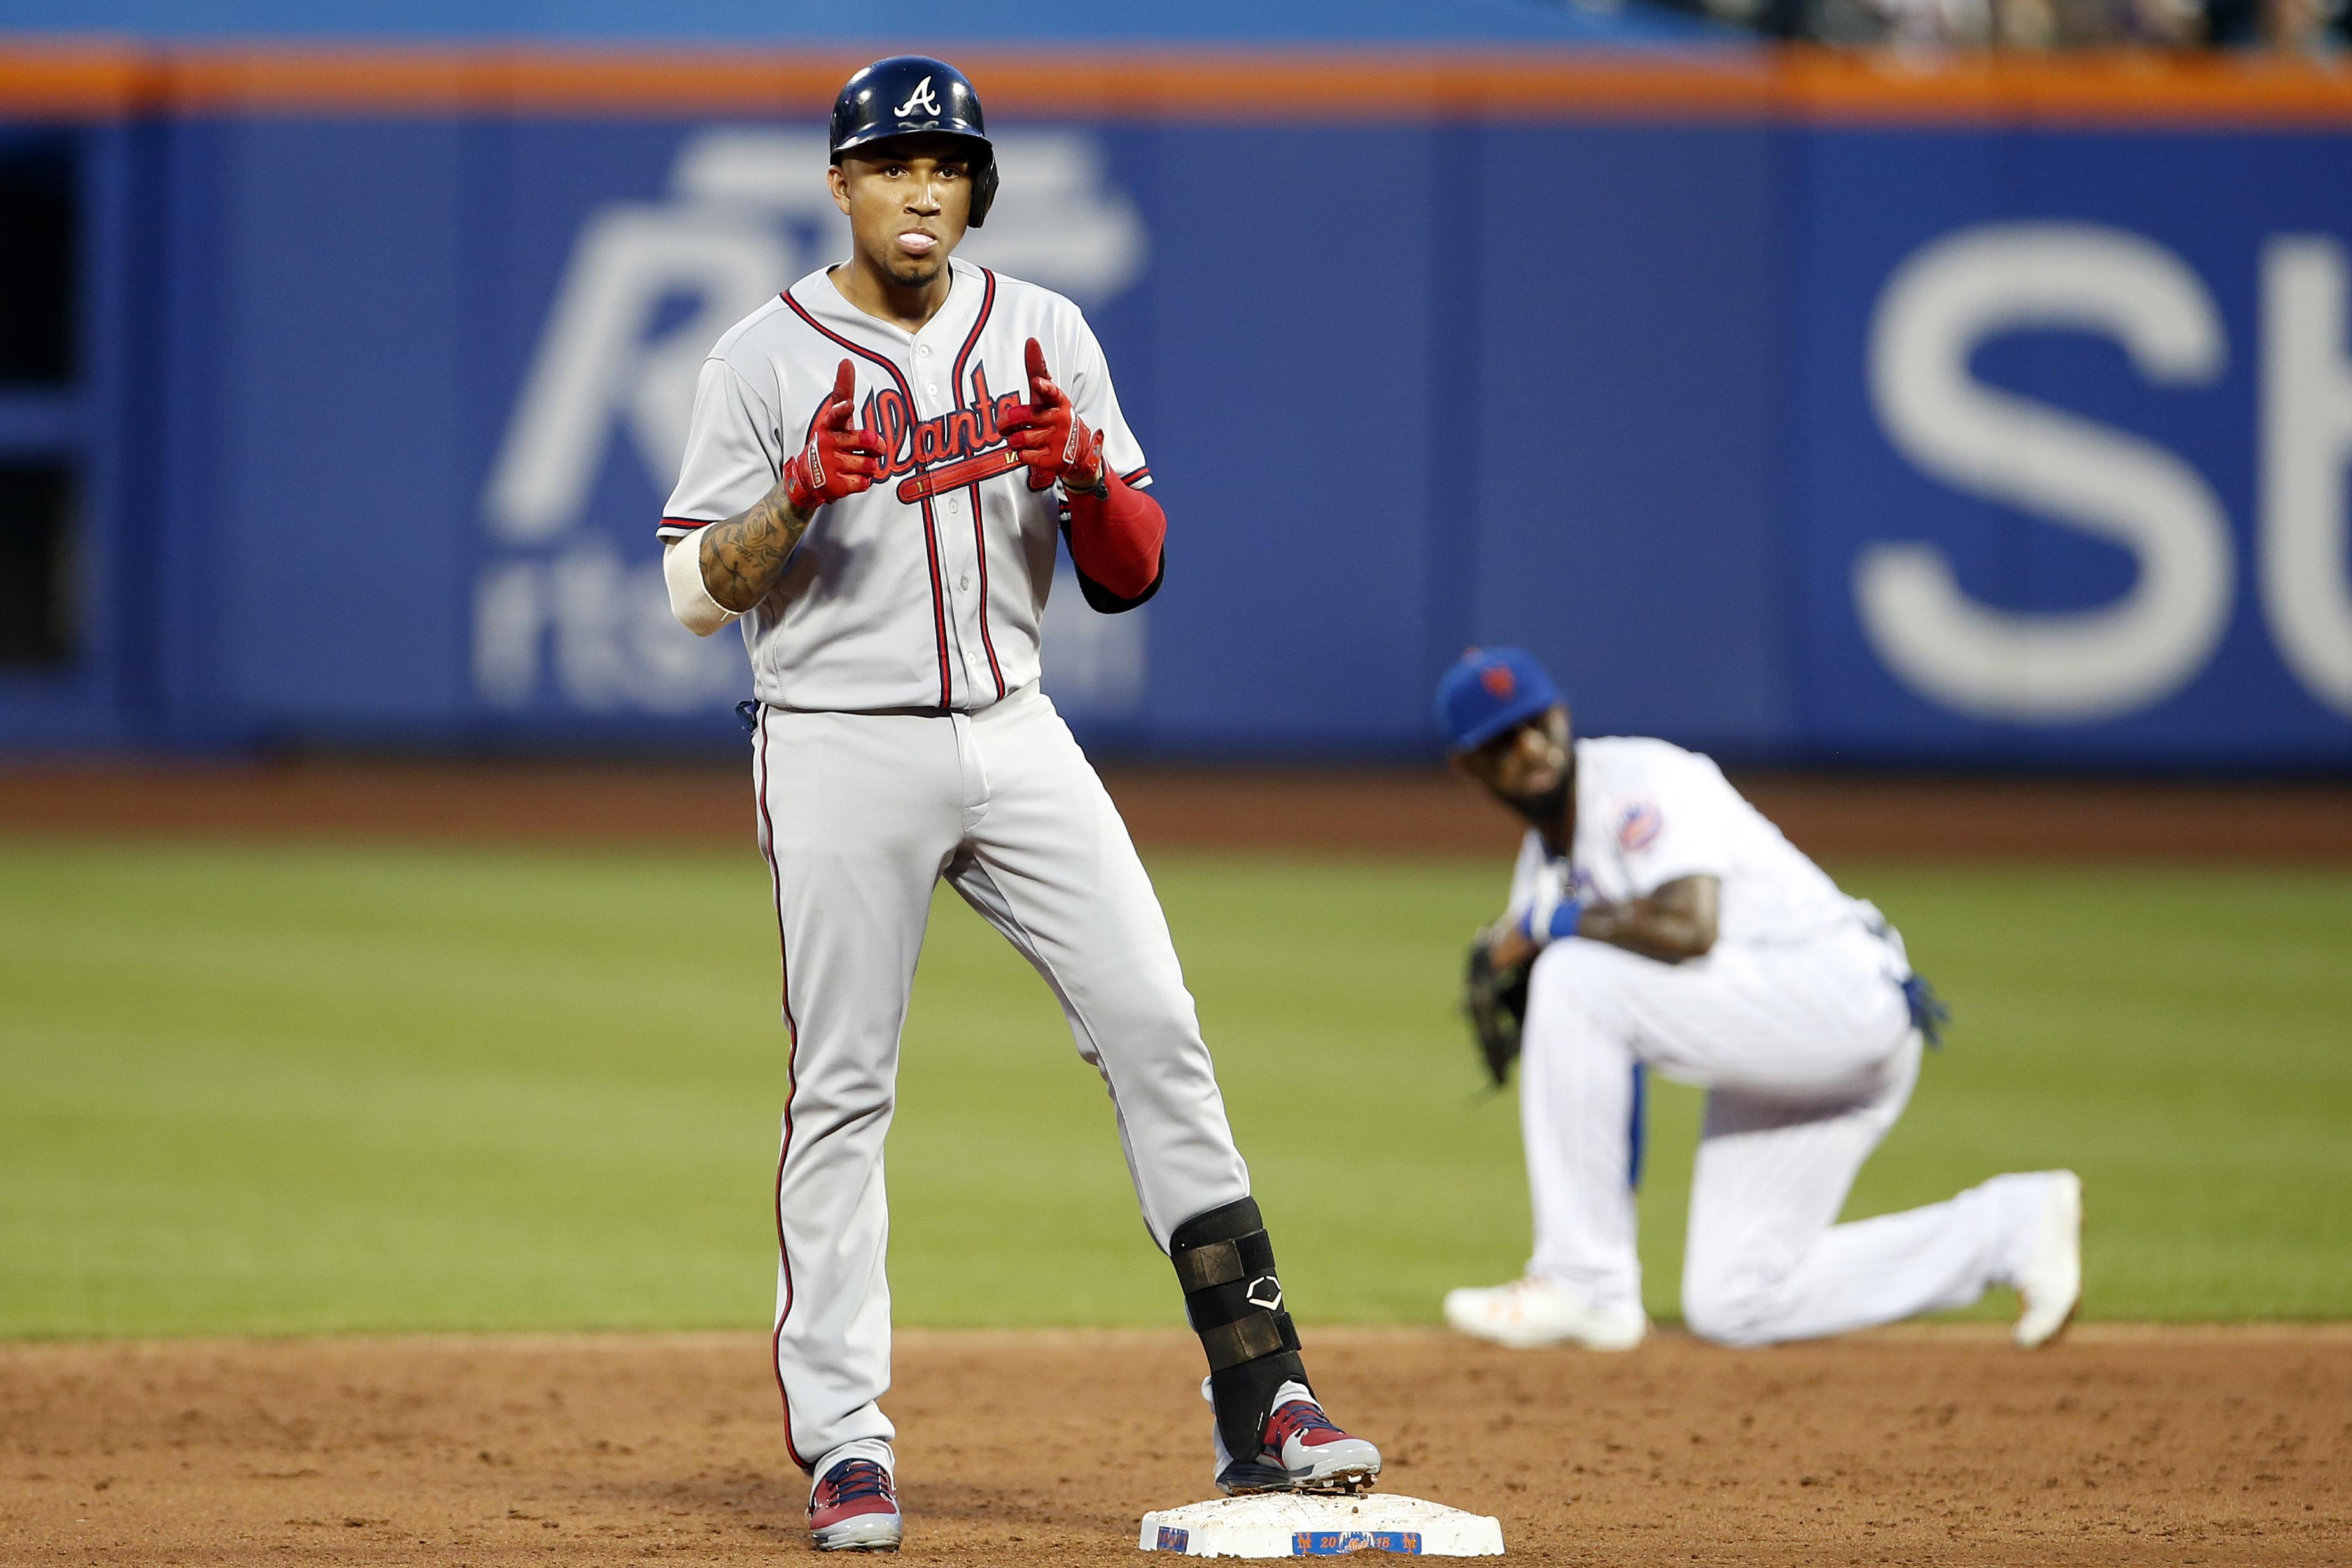 8/3/18 Game Preview: Atlanta Braves at New York Mets